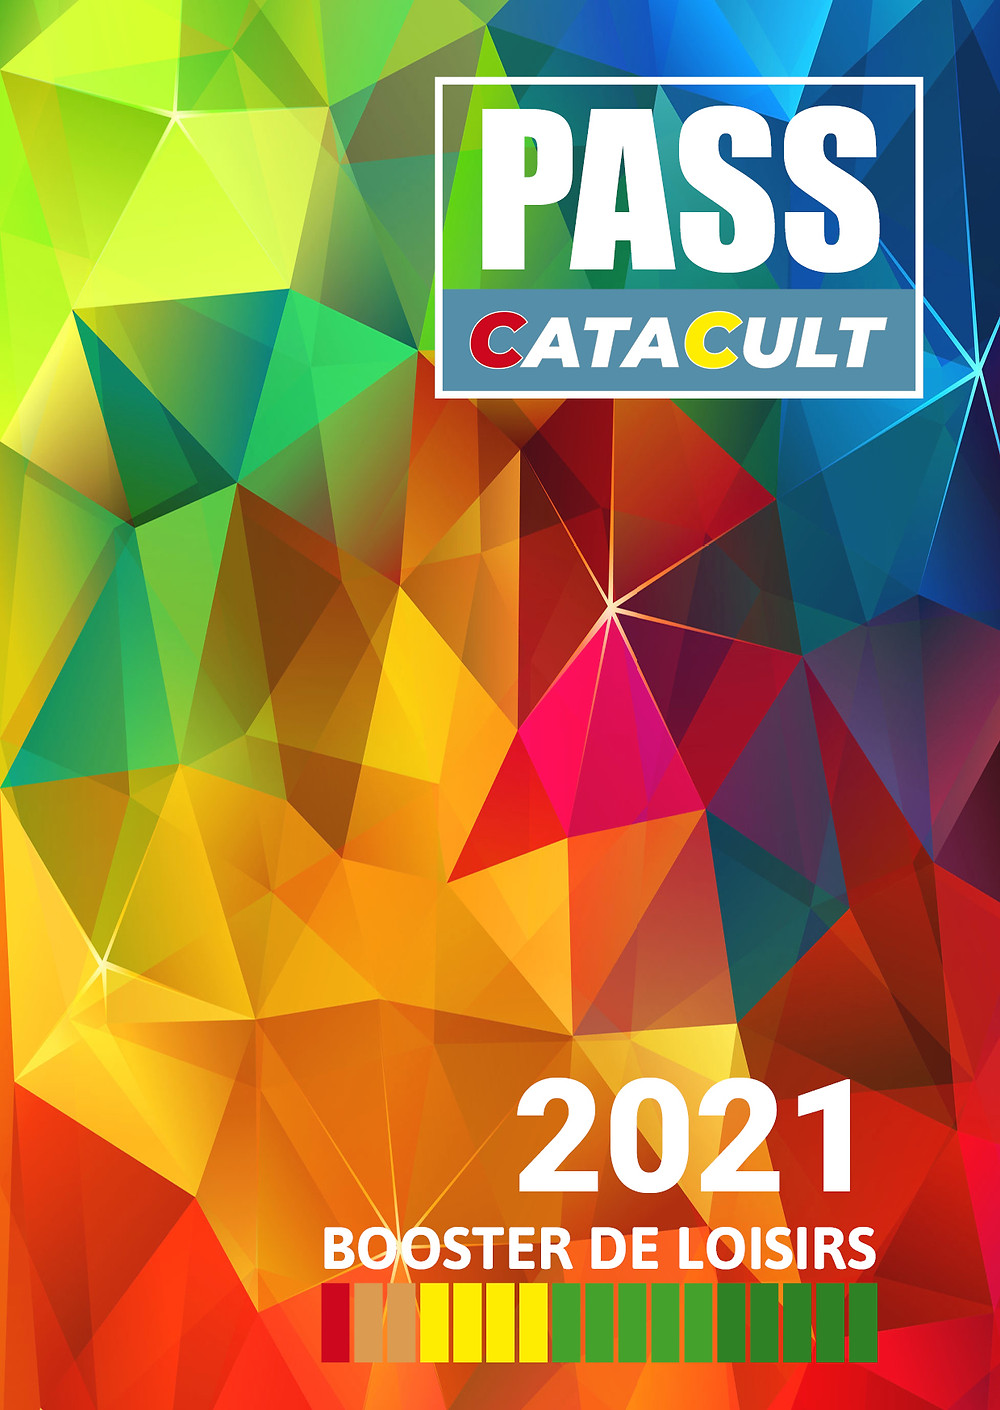 Le Pass CataCult 2021